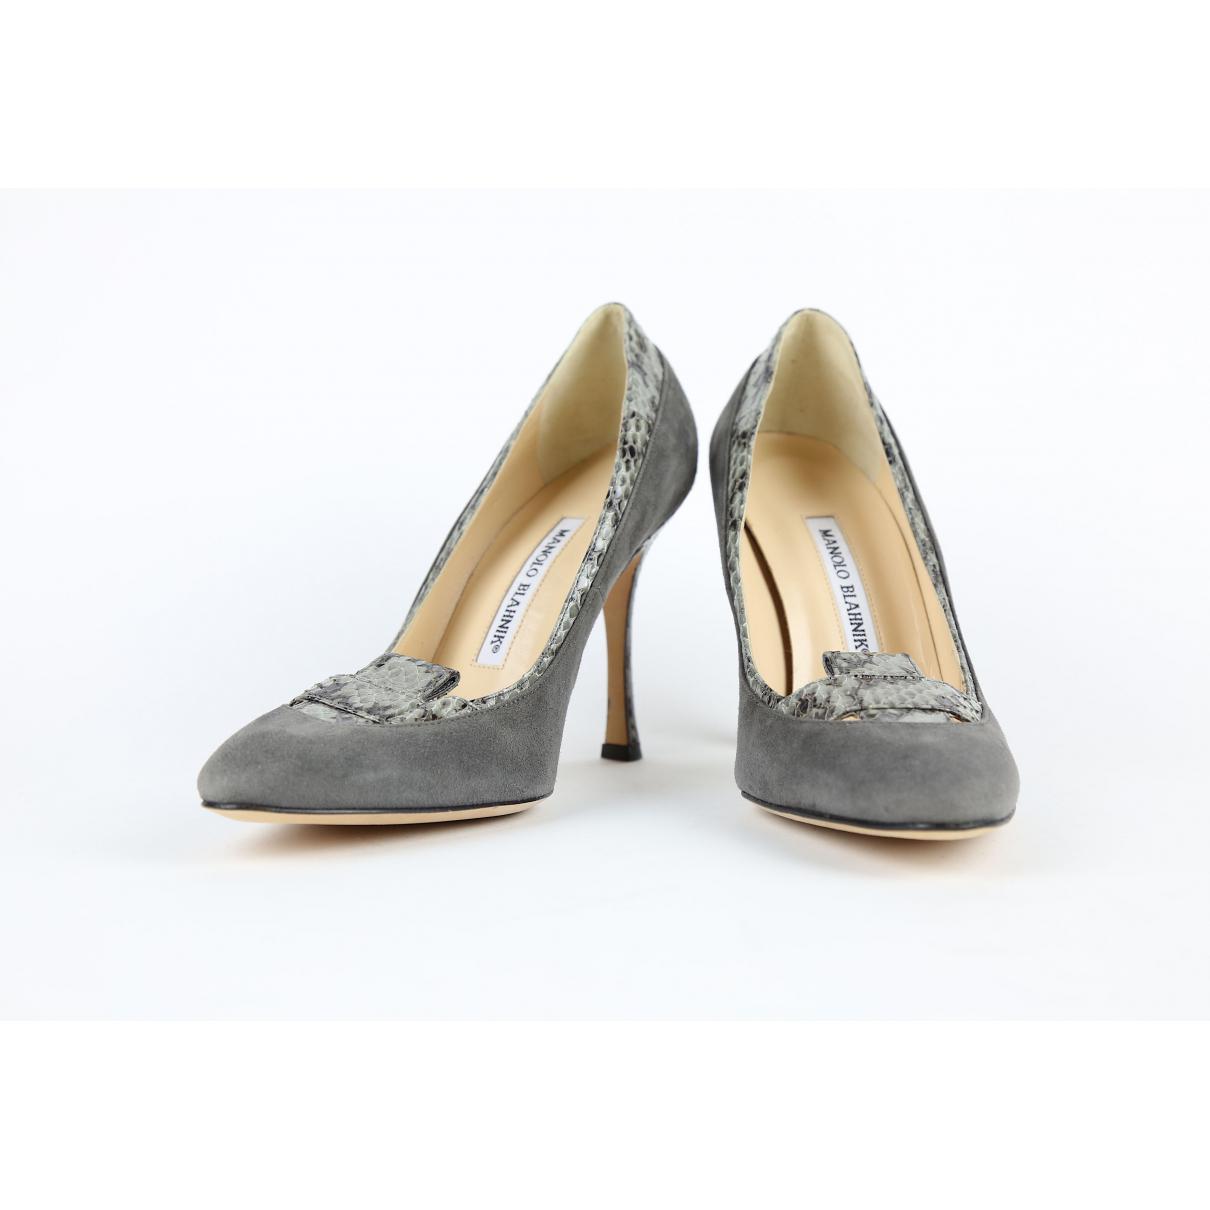 1aa1a8c9a139f Manolo Blahnik - Gray Grey Suede Heels - Lyst. View fullscreen